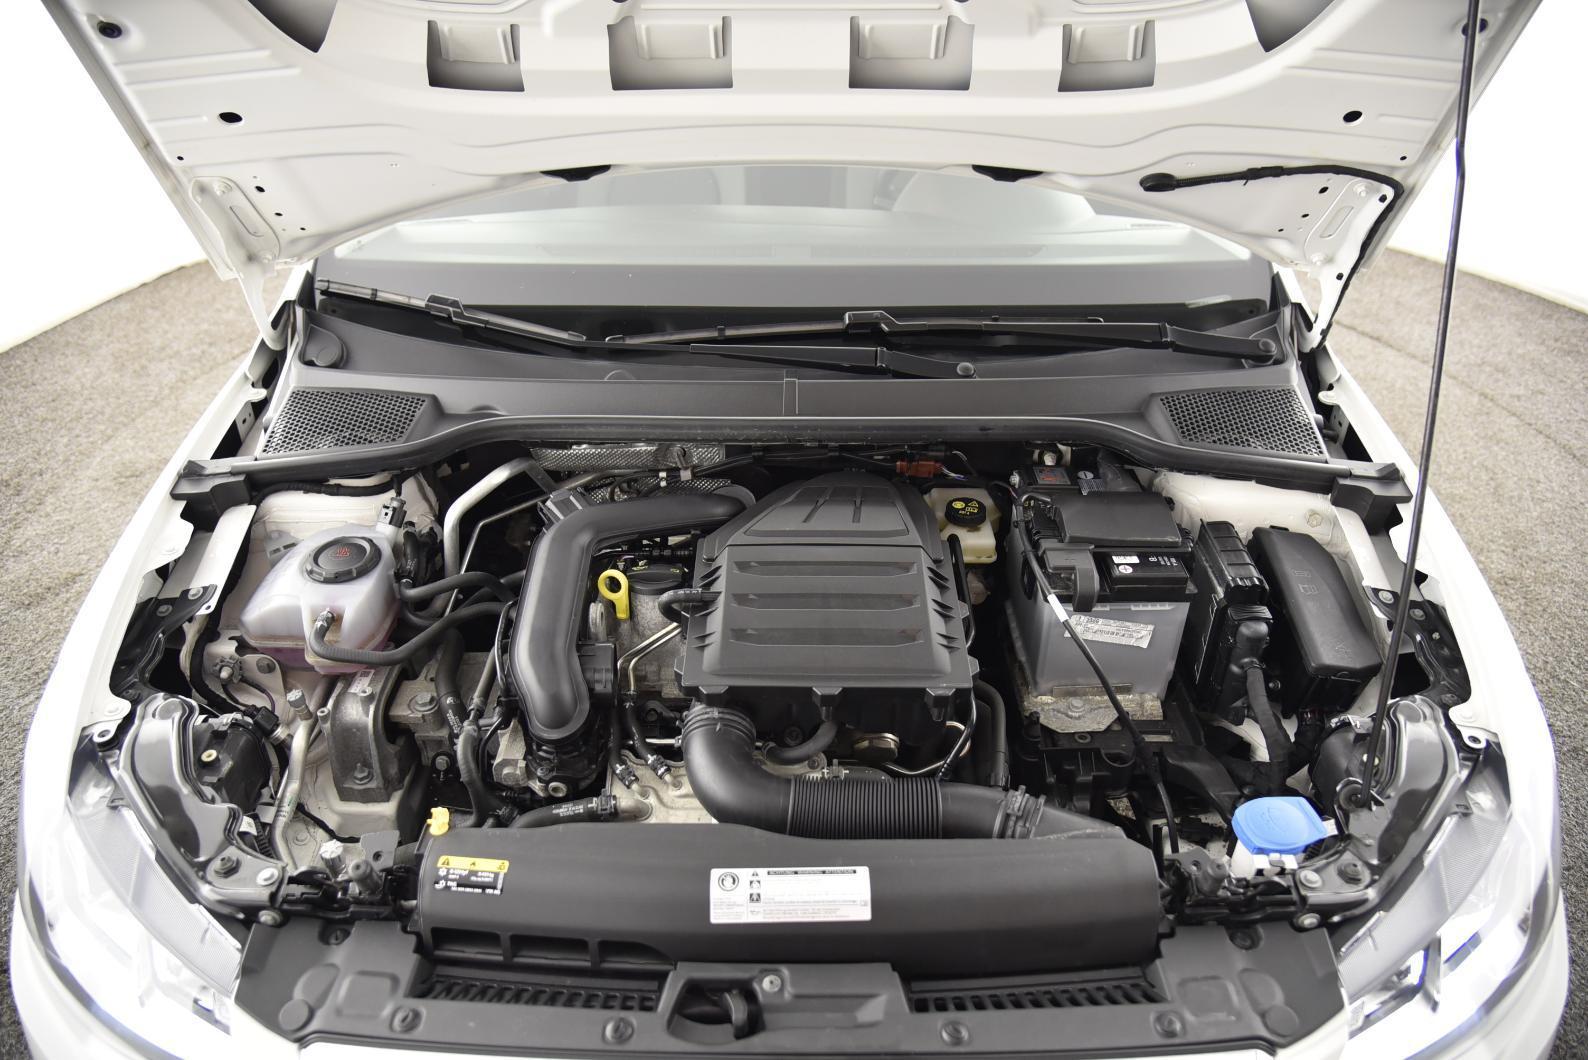 SEAT IBIZA 1.0 EcoTSI 95 ch S/S BVM5 Style